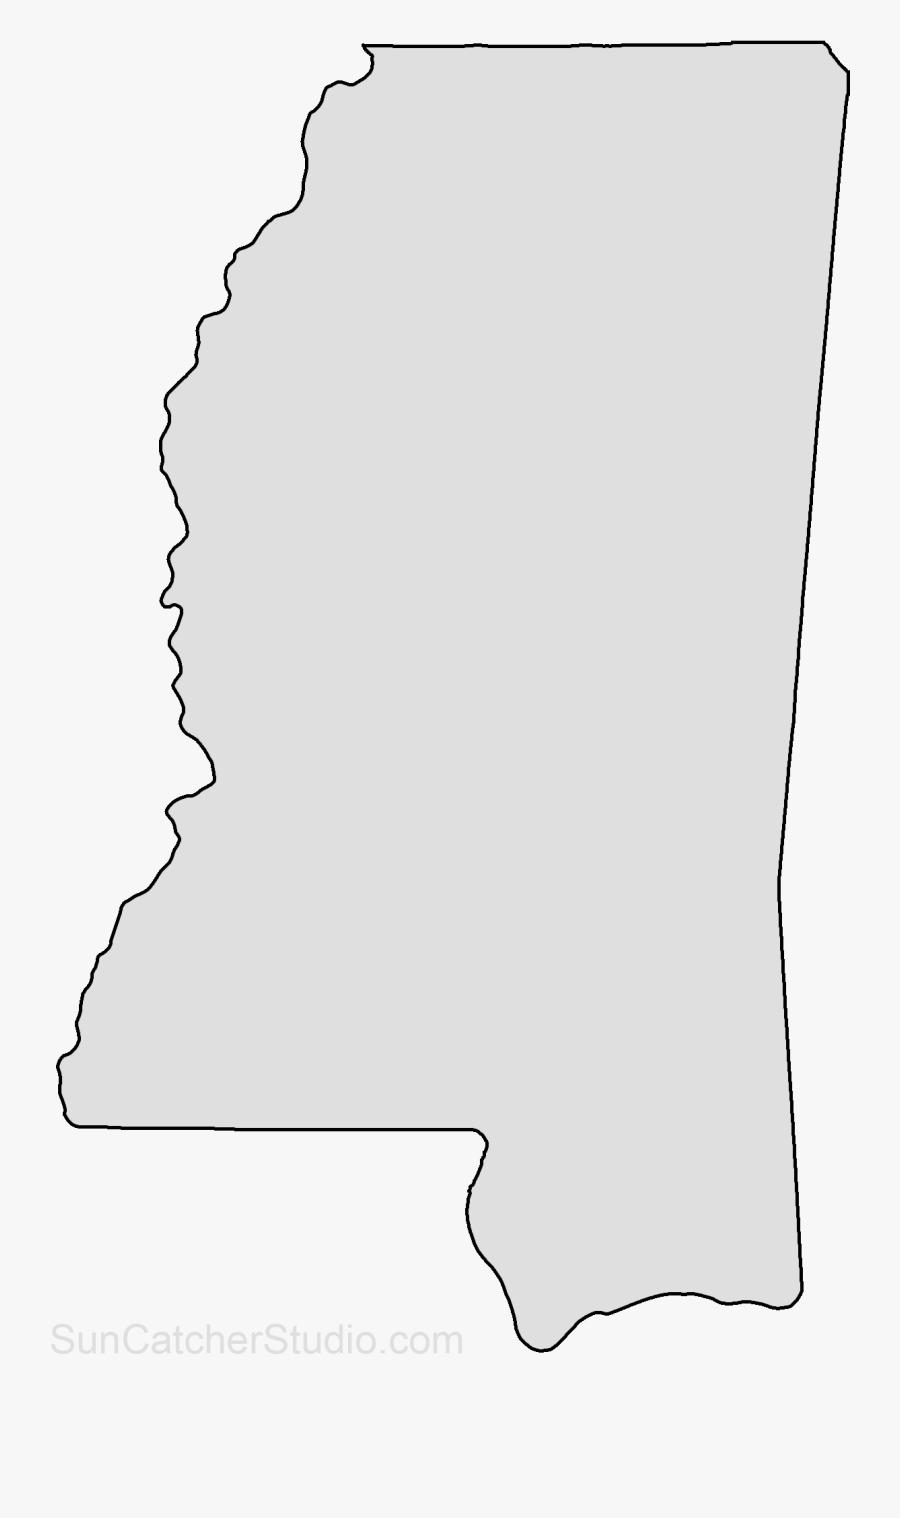 Ohio State University Alpha Phi Alpha Florida International - Mississippi Shape Of State, Transparent Clipart